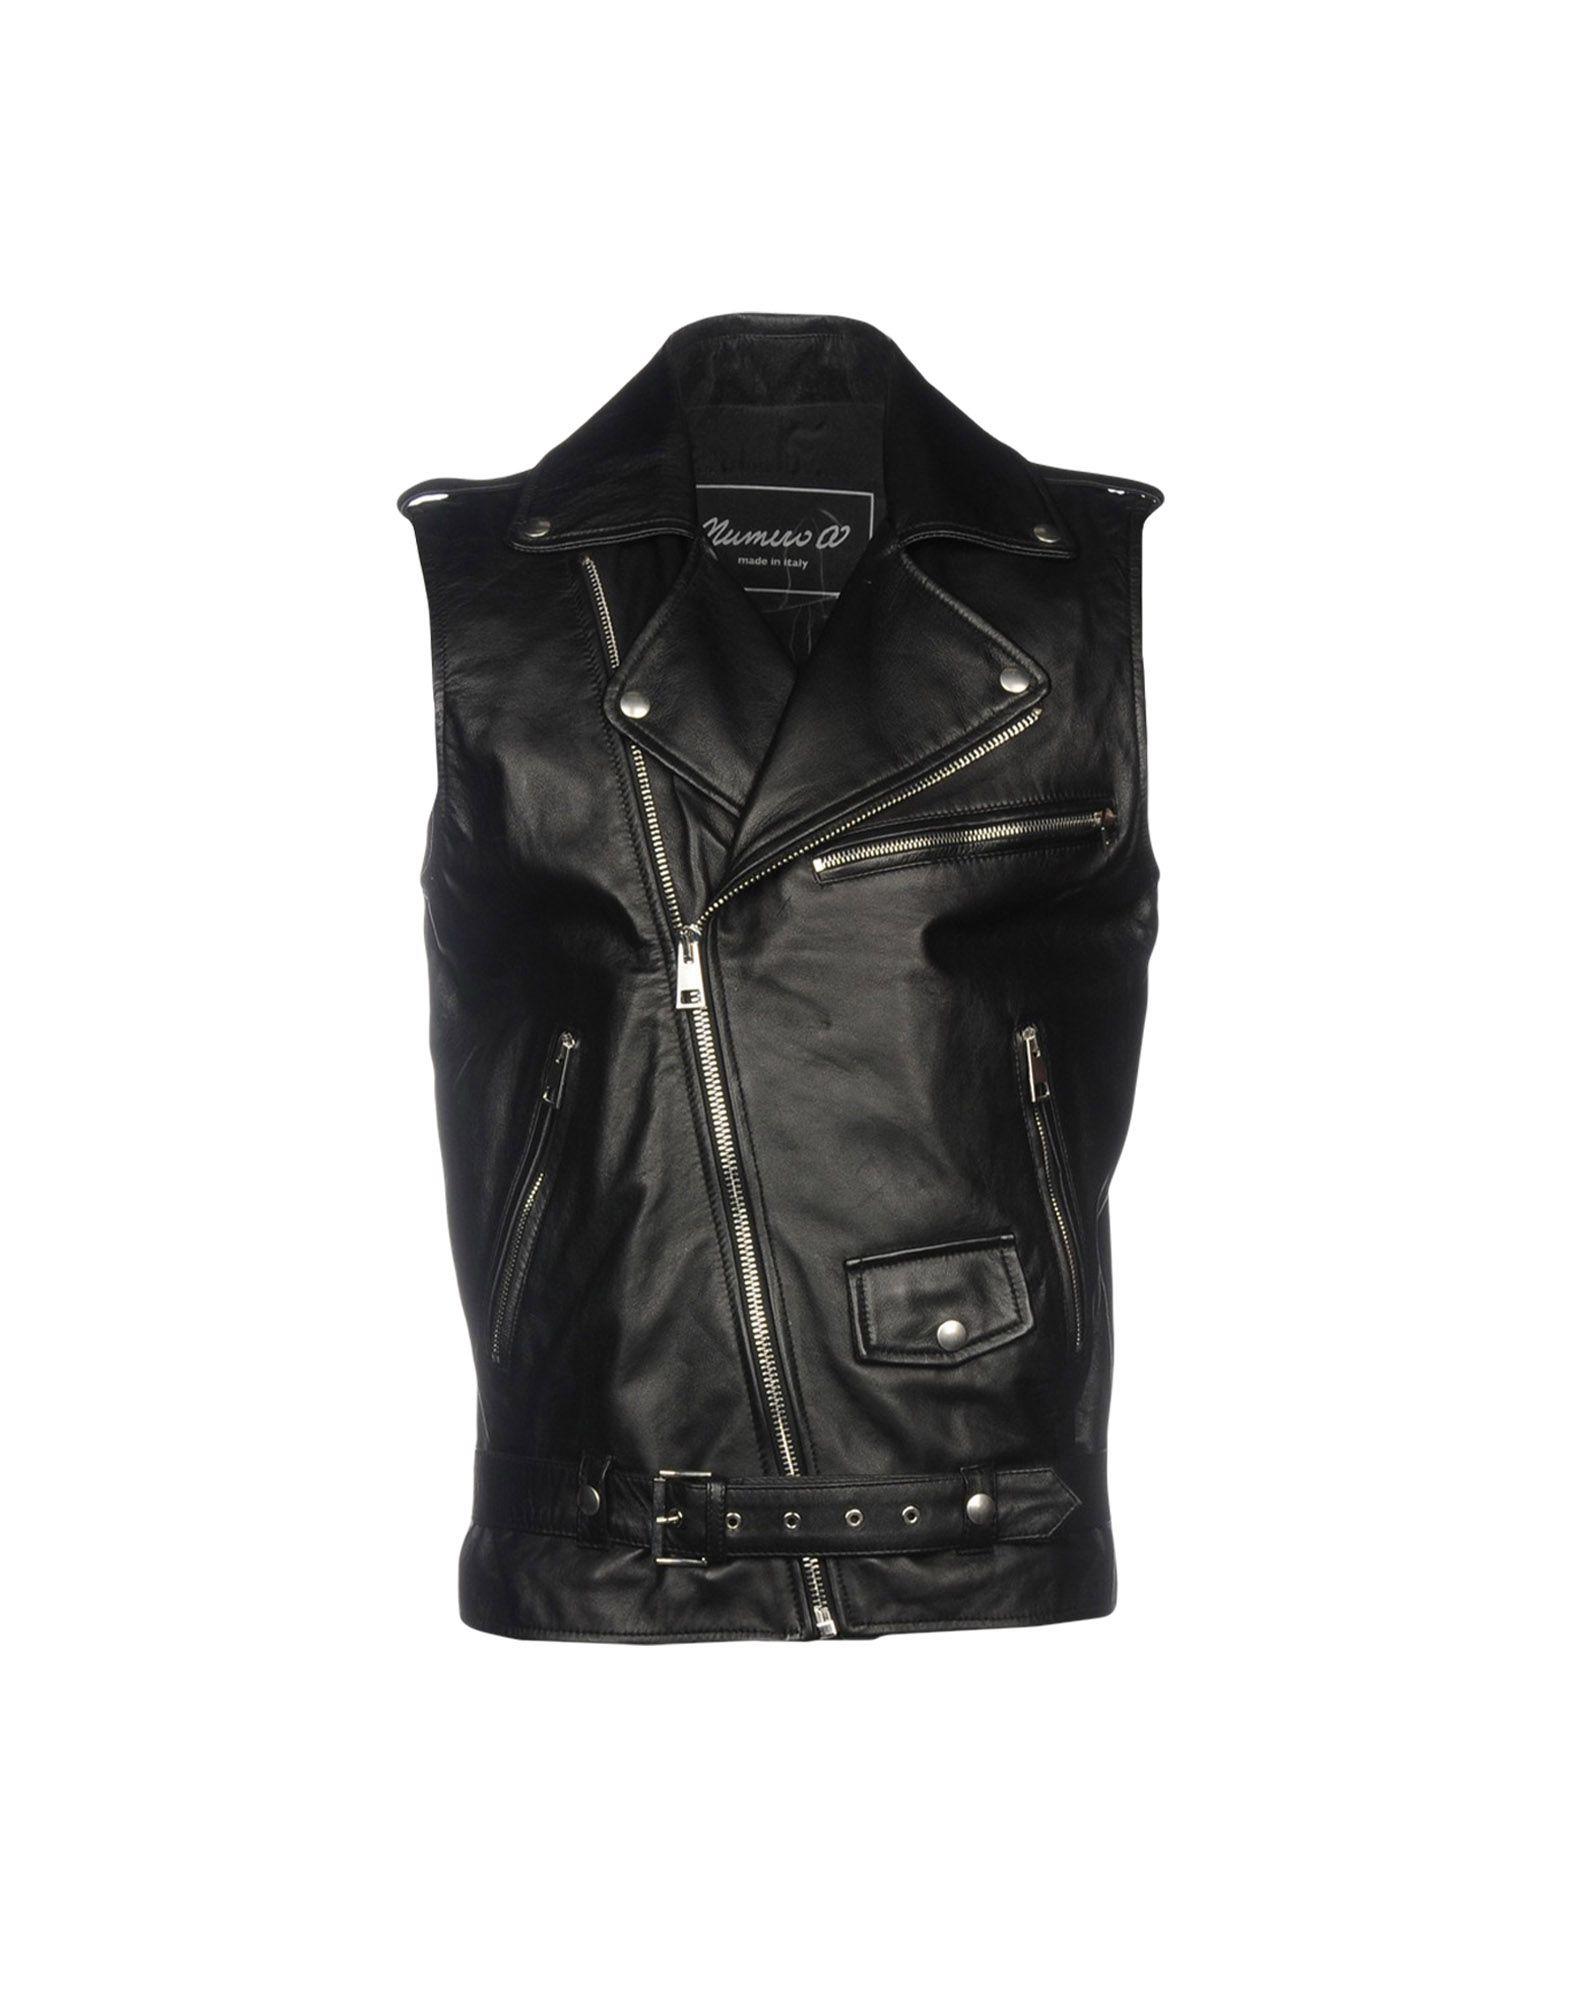 NUMERO 00 Biker Jacket in Black